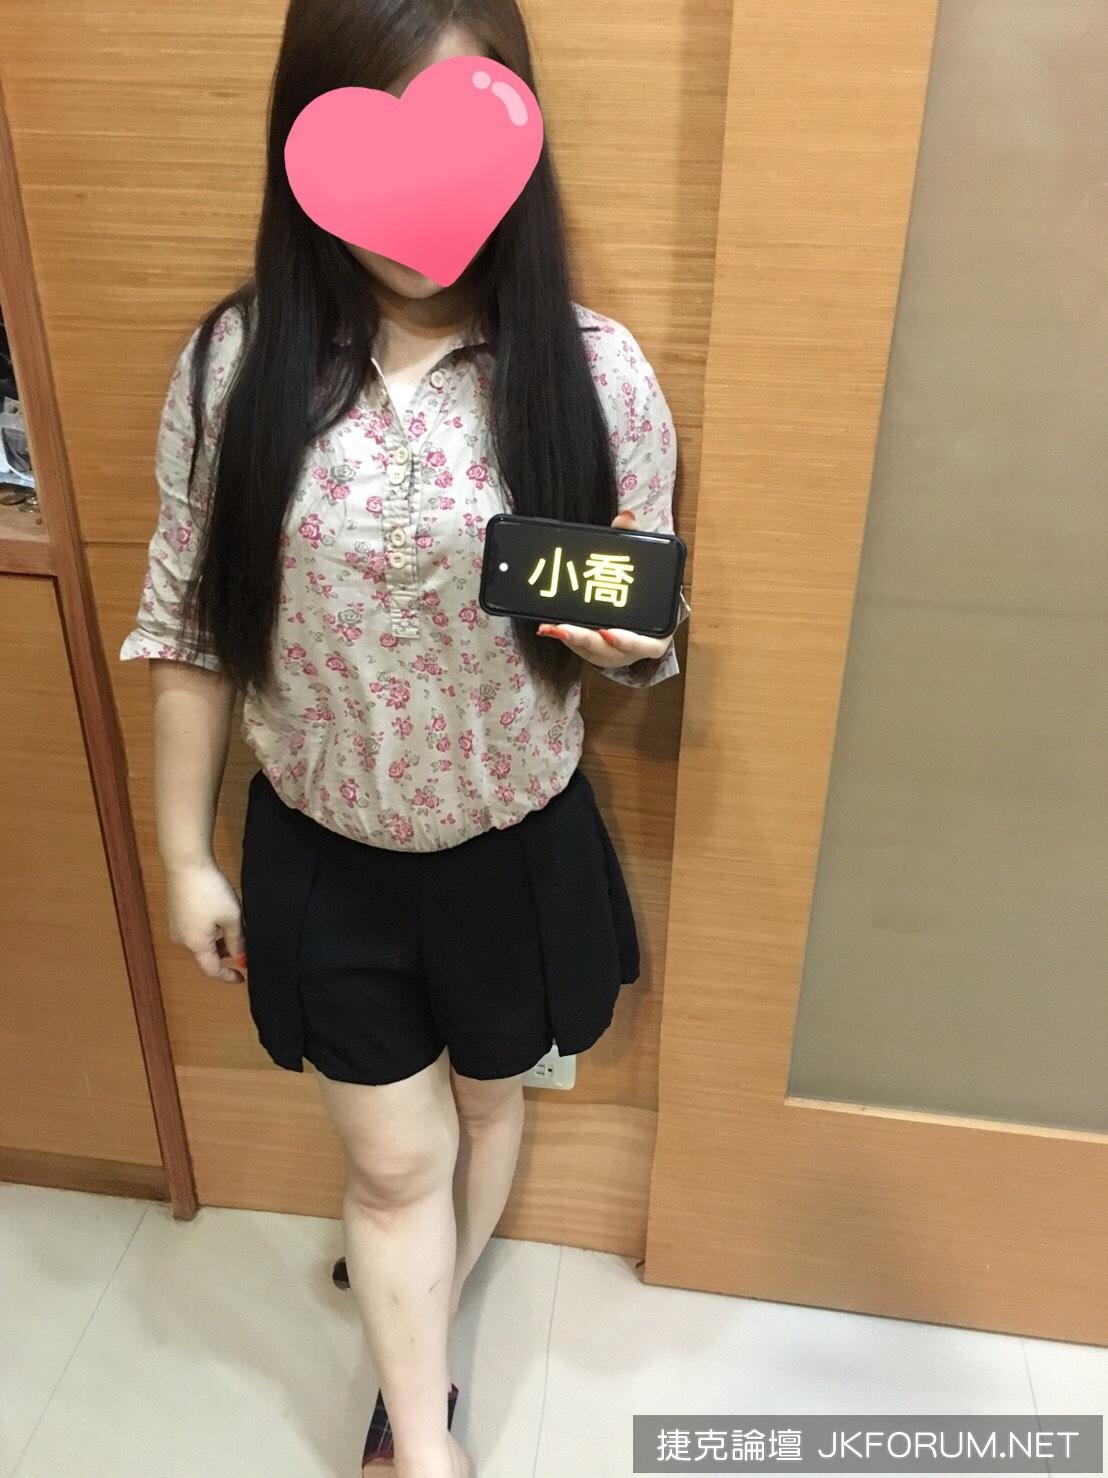 S__13459479.jpg